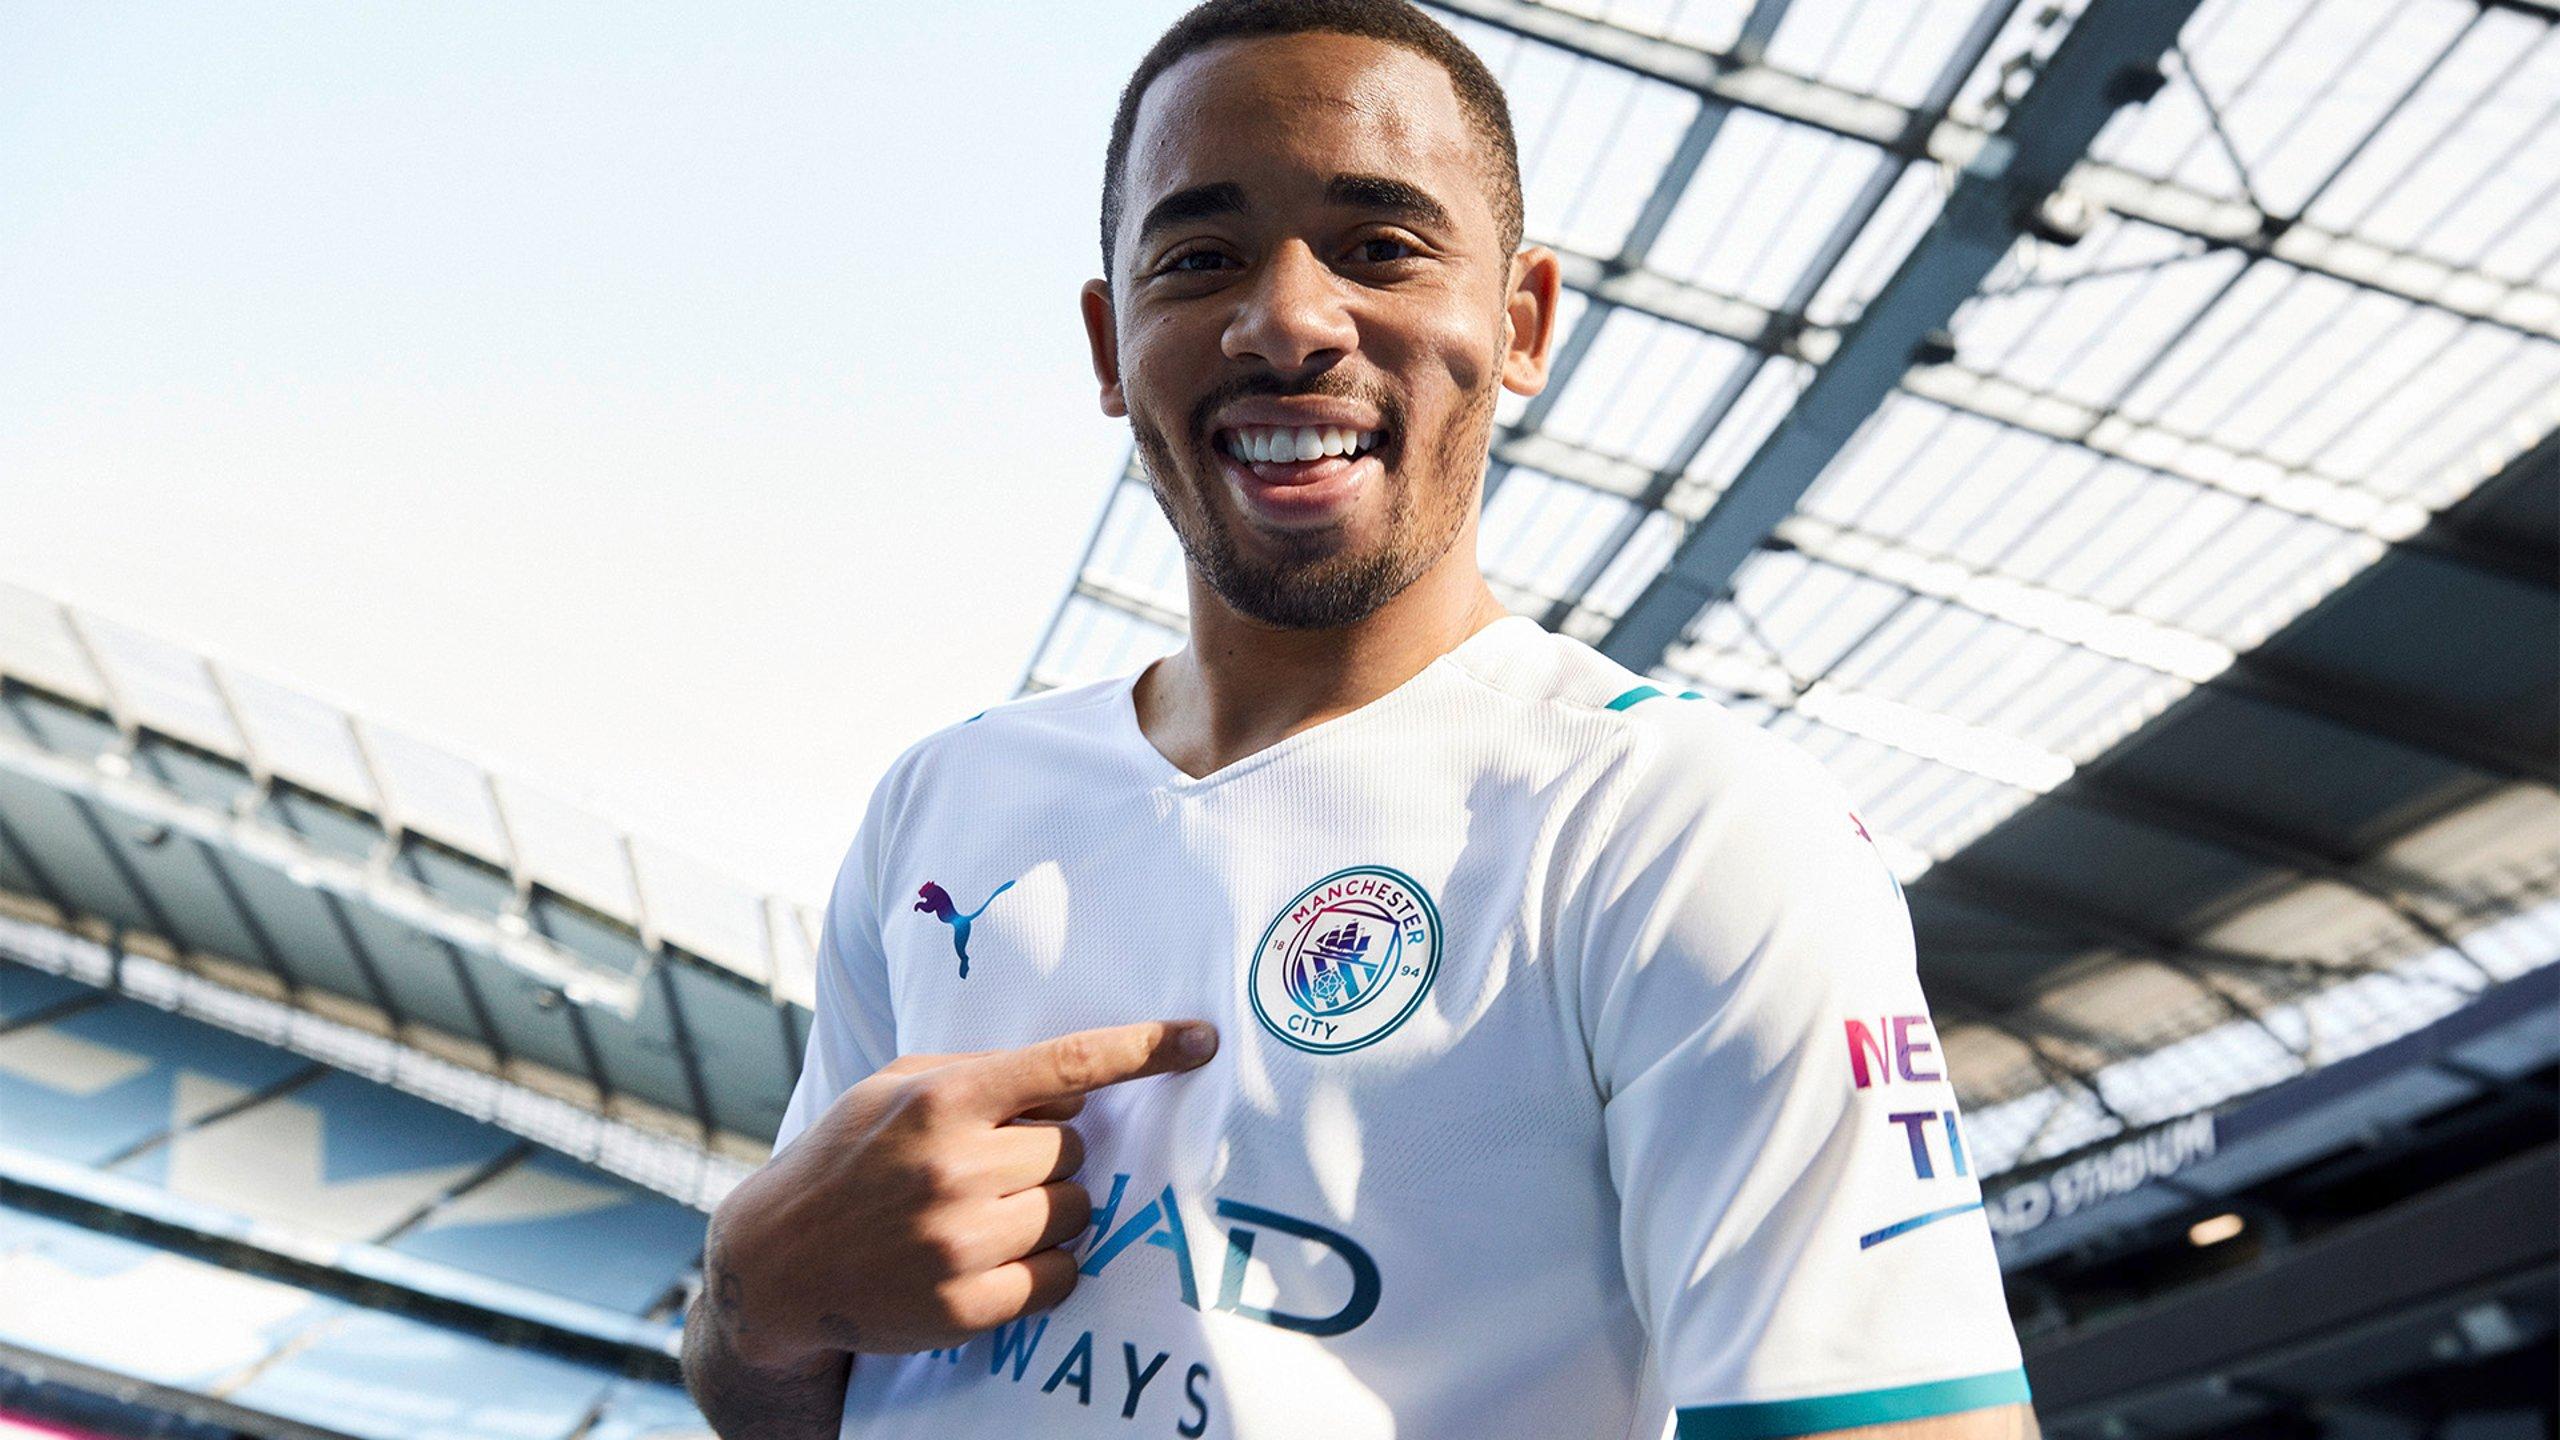 Gallery: 2021-22 away kit players' photoshoot